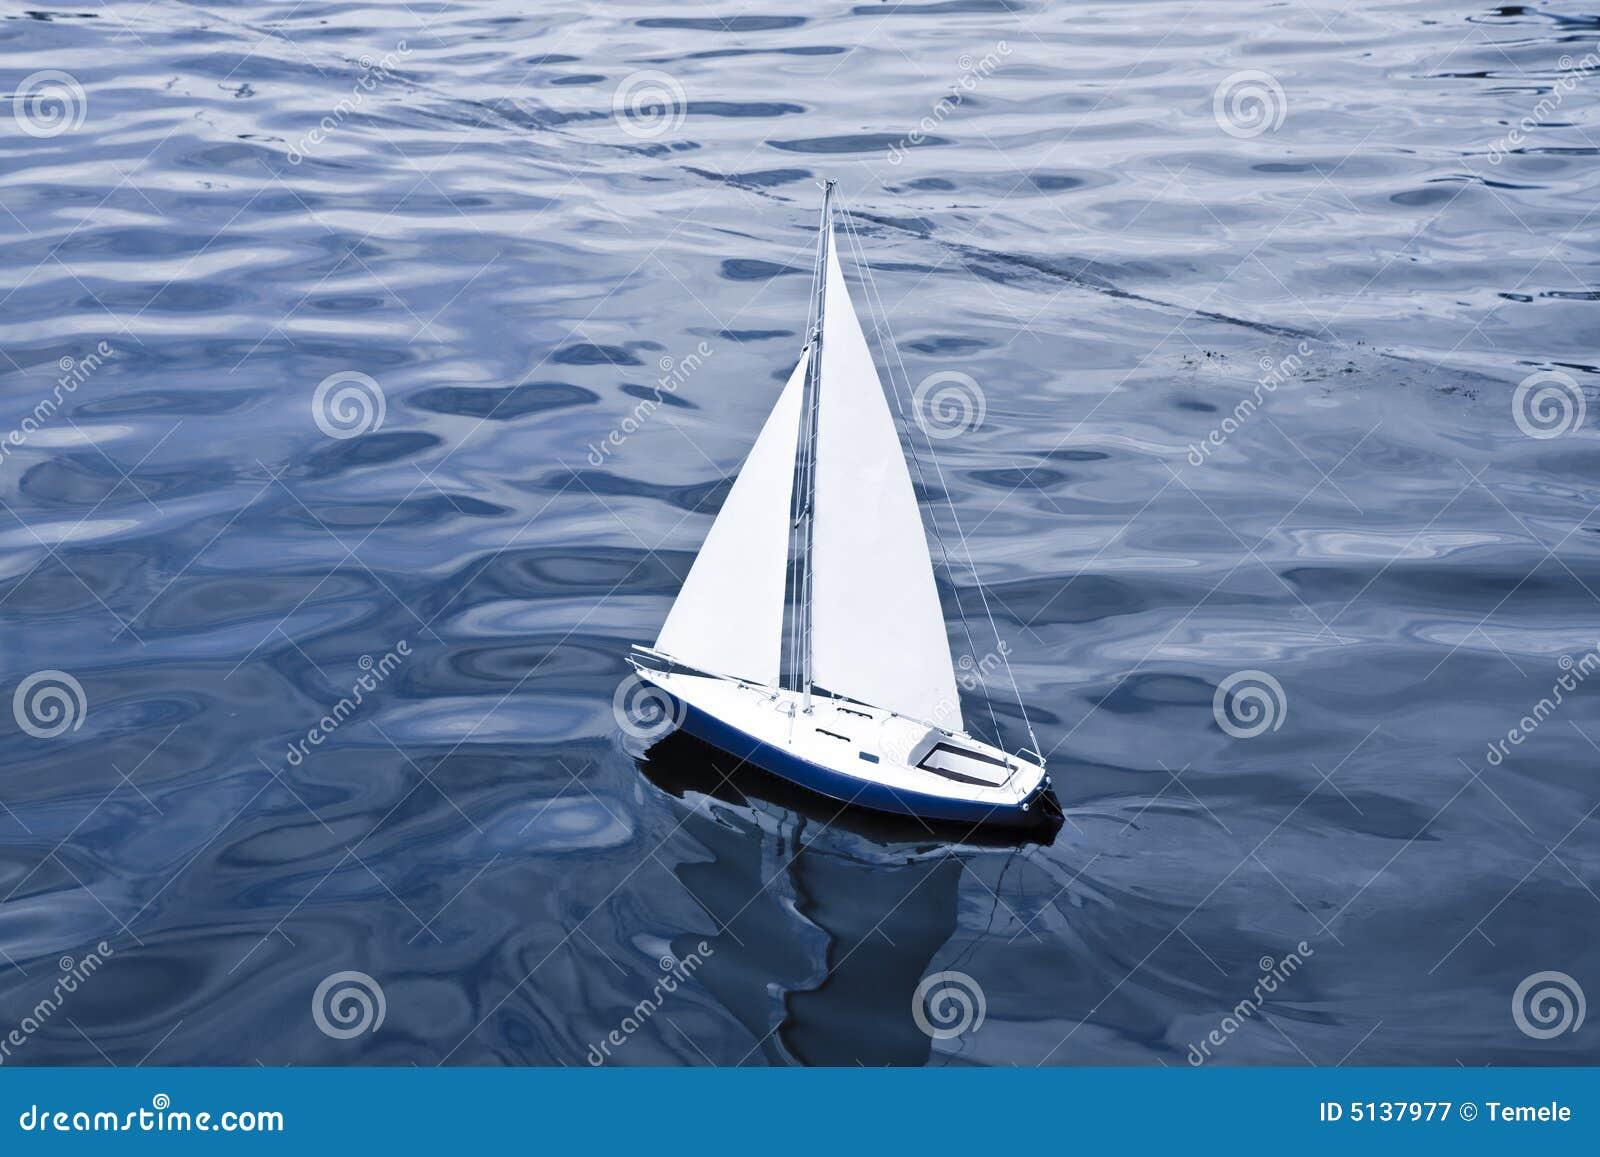 Small Model Of Sailboat Royalty Free Stock Photography ...